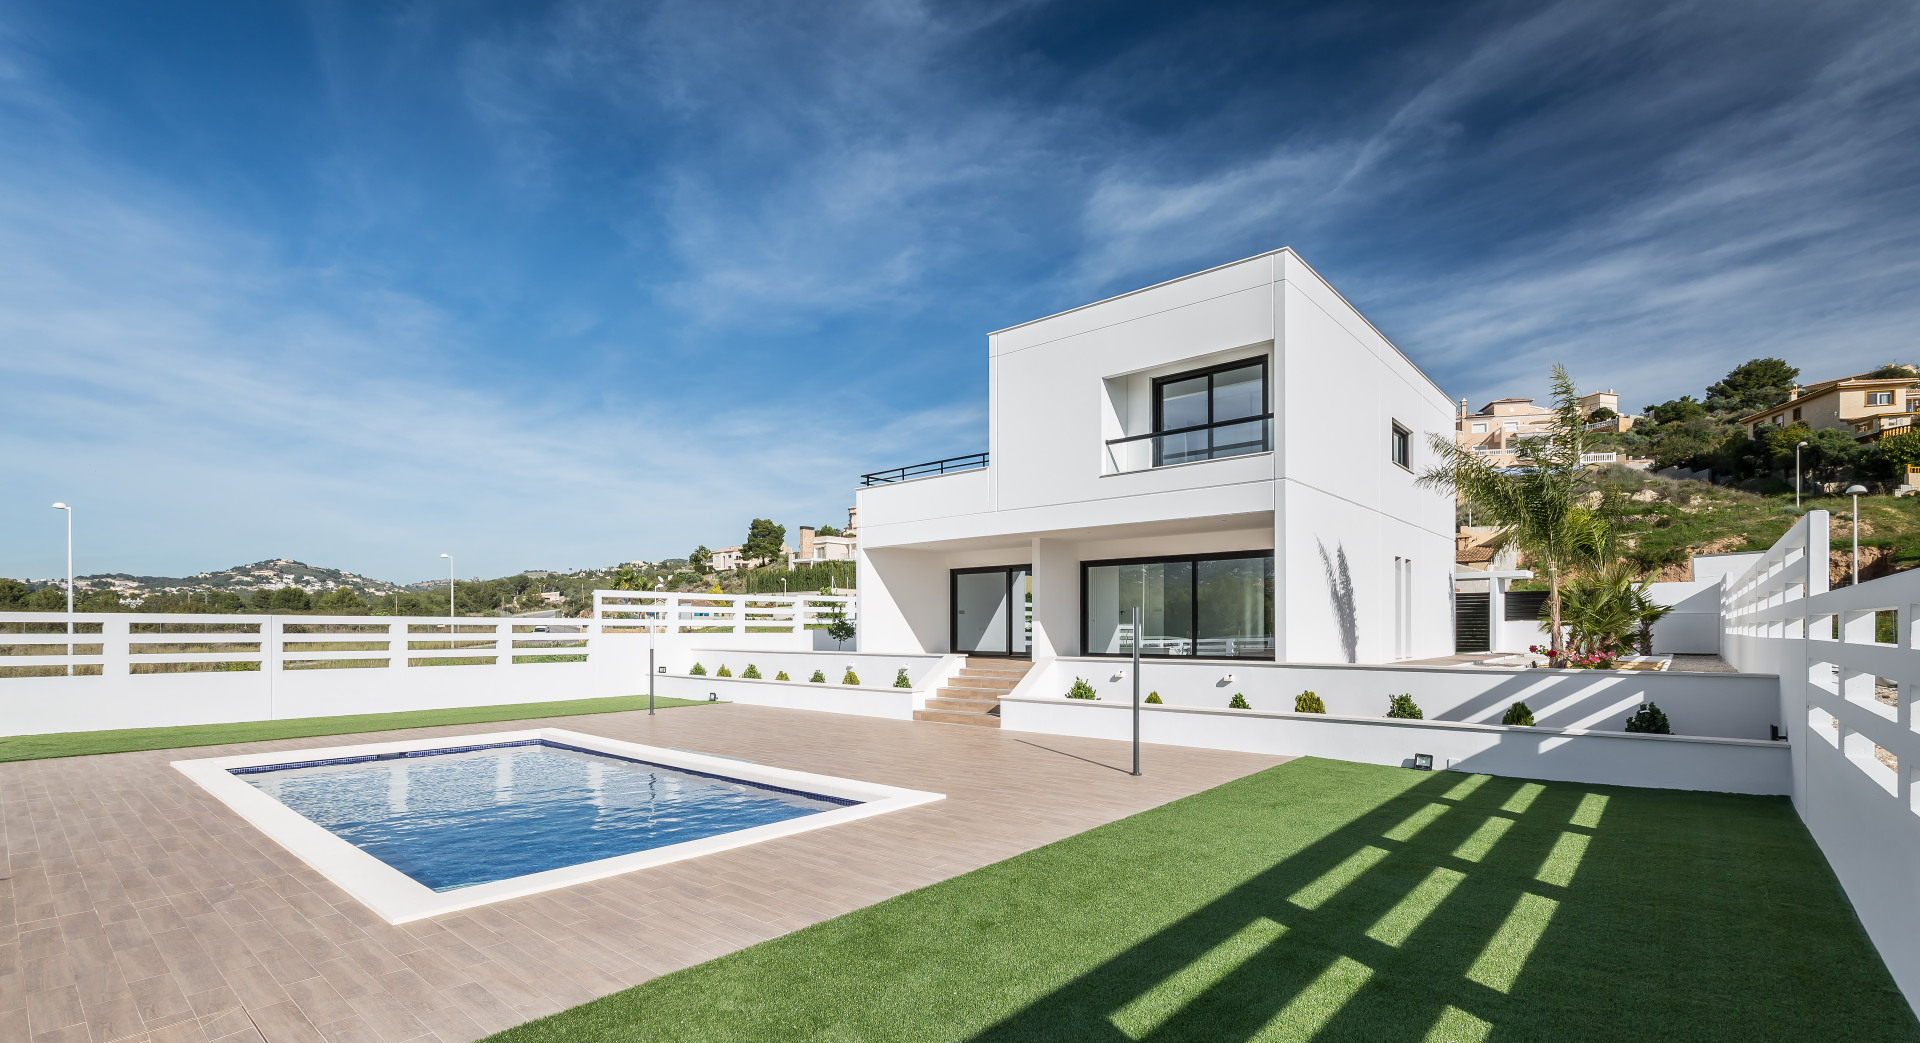 fotografia-arquitectura-valencia-german-cabo-viraje-vivienda-unifamiliar-calpe (7)